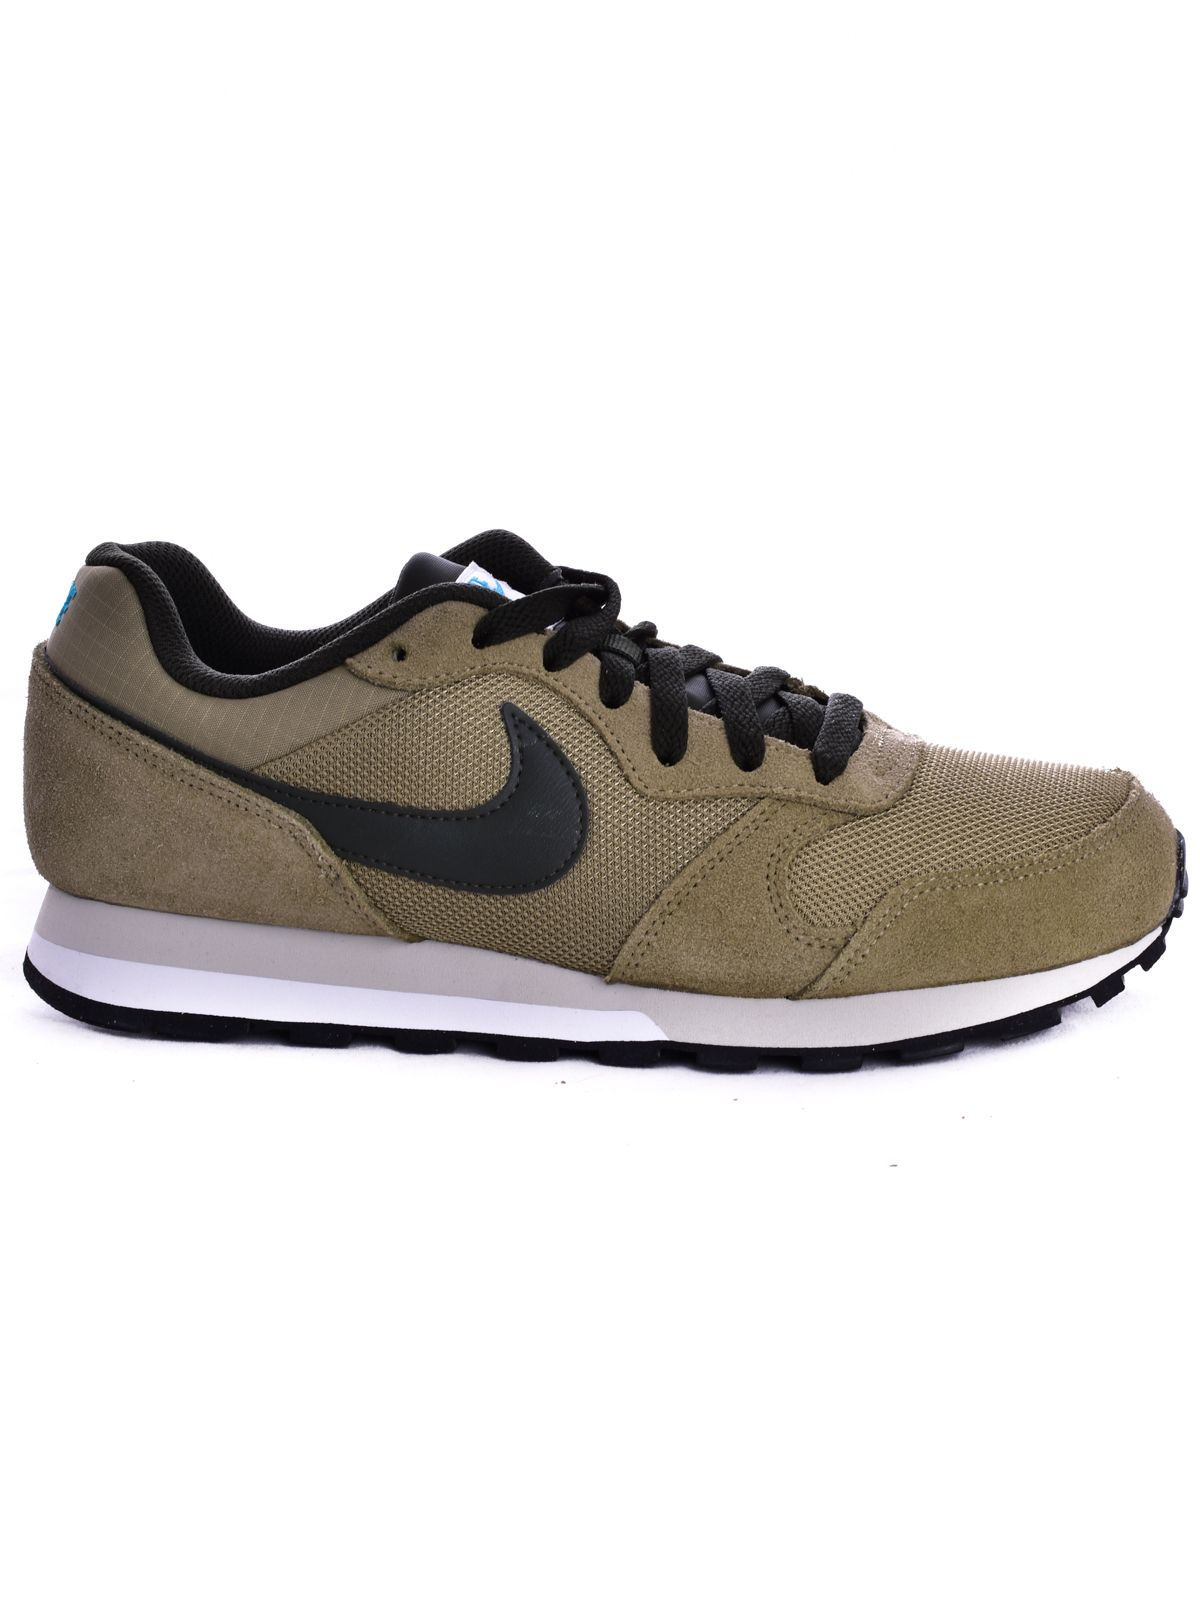 Nike férfi cipő MD Runner 2 Shoe ... 9a802d4746